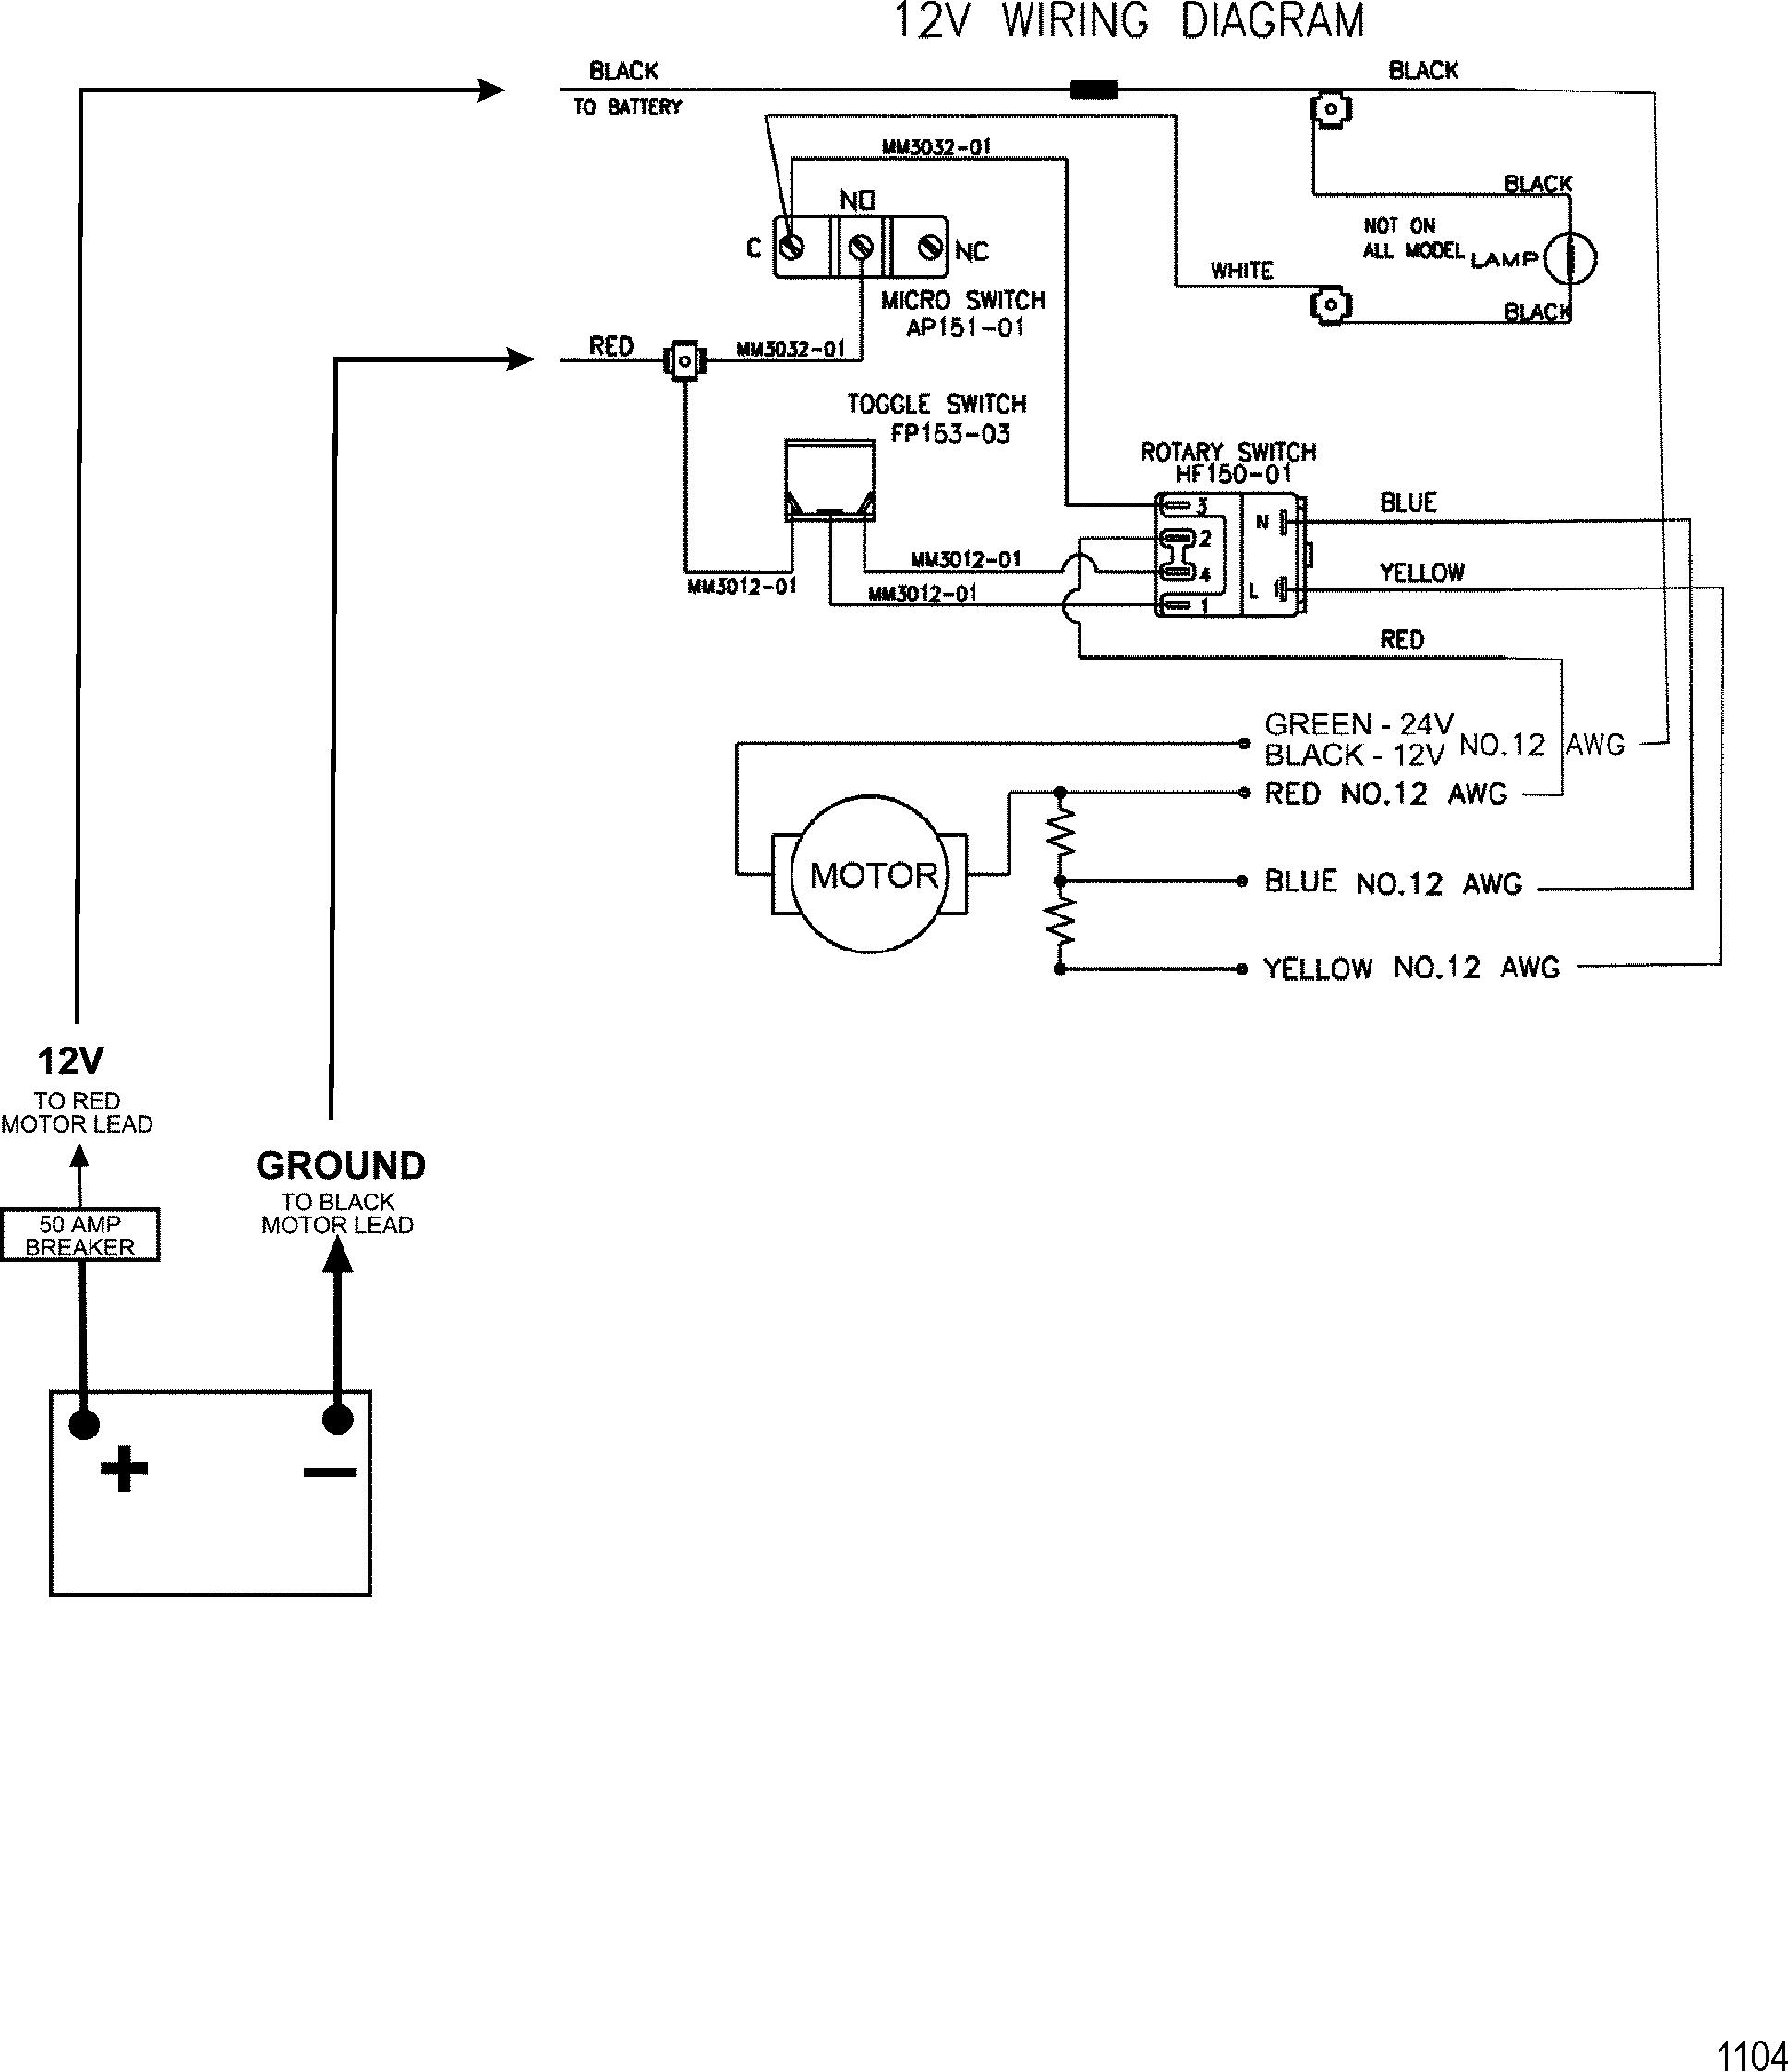 Motorguide Trolling Motor Wiring Diagram | Manual E-Books - Motorguide Trolling Motor Wiring Diagram